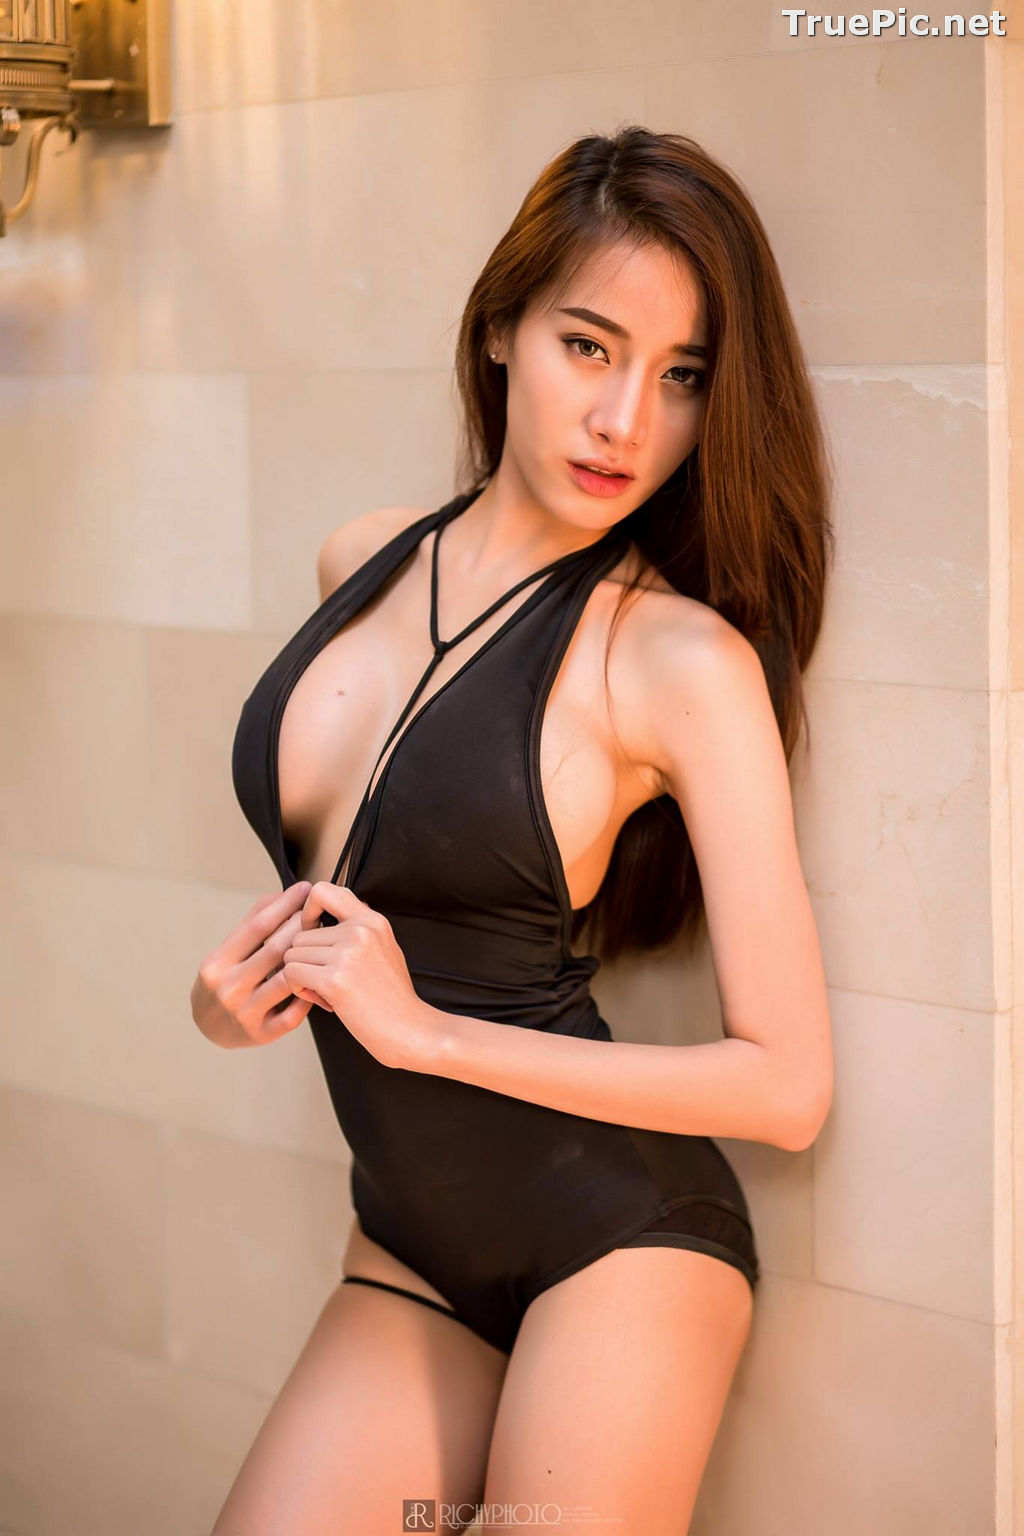 Image Thailand Model - Pichana Yoosuk - Black One Piece Swimsuit - TruePic.net - Picture-2